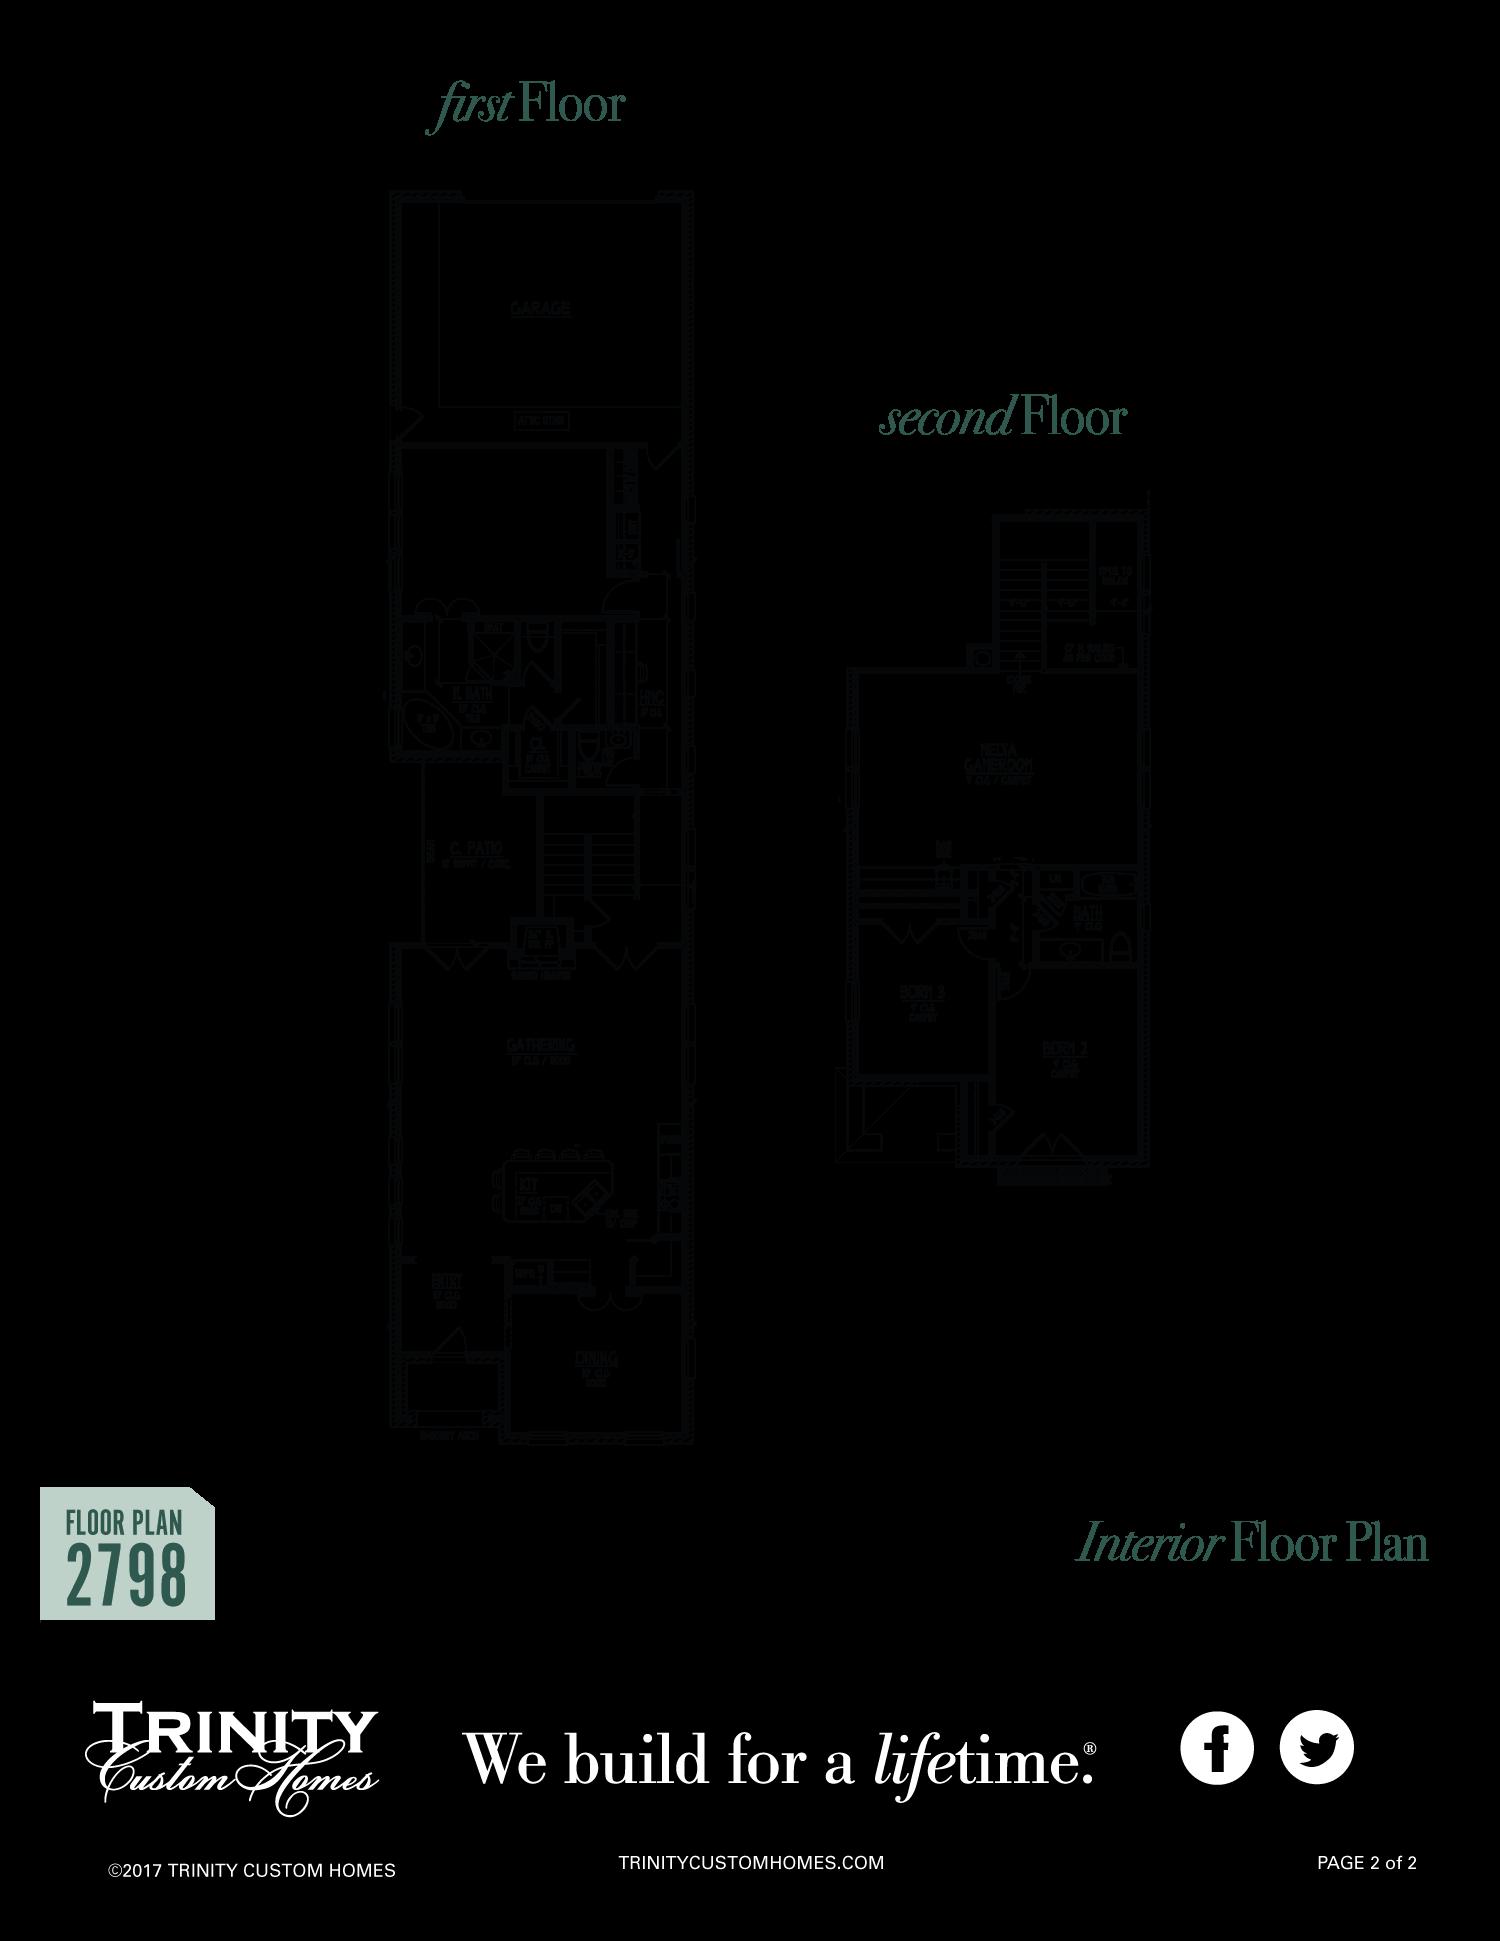 FloorPlan2798